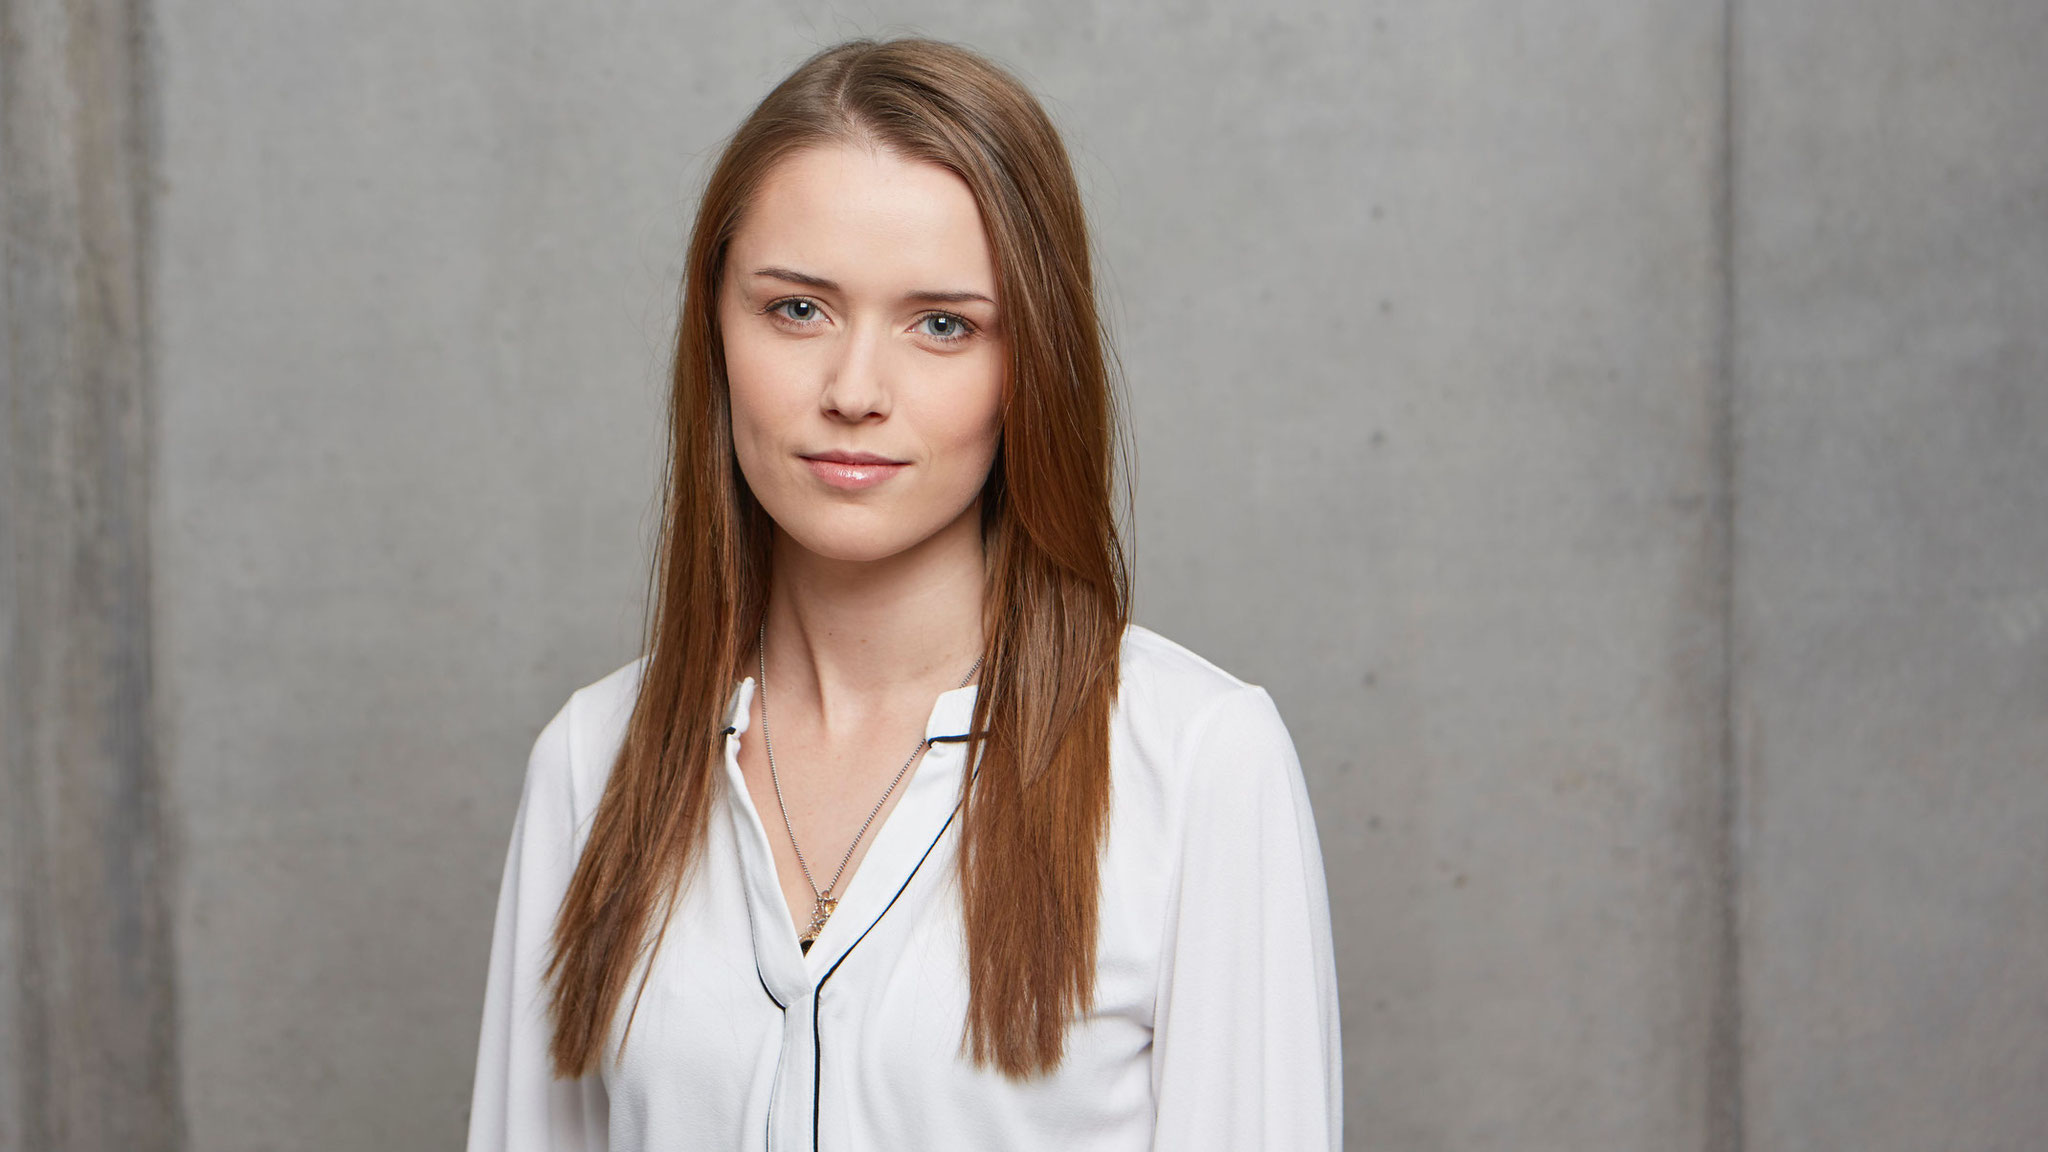 Natalie Wallner